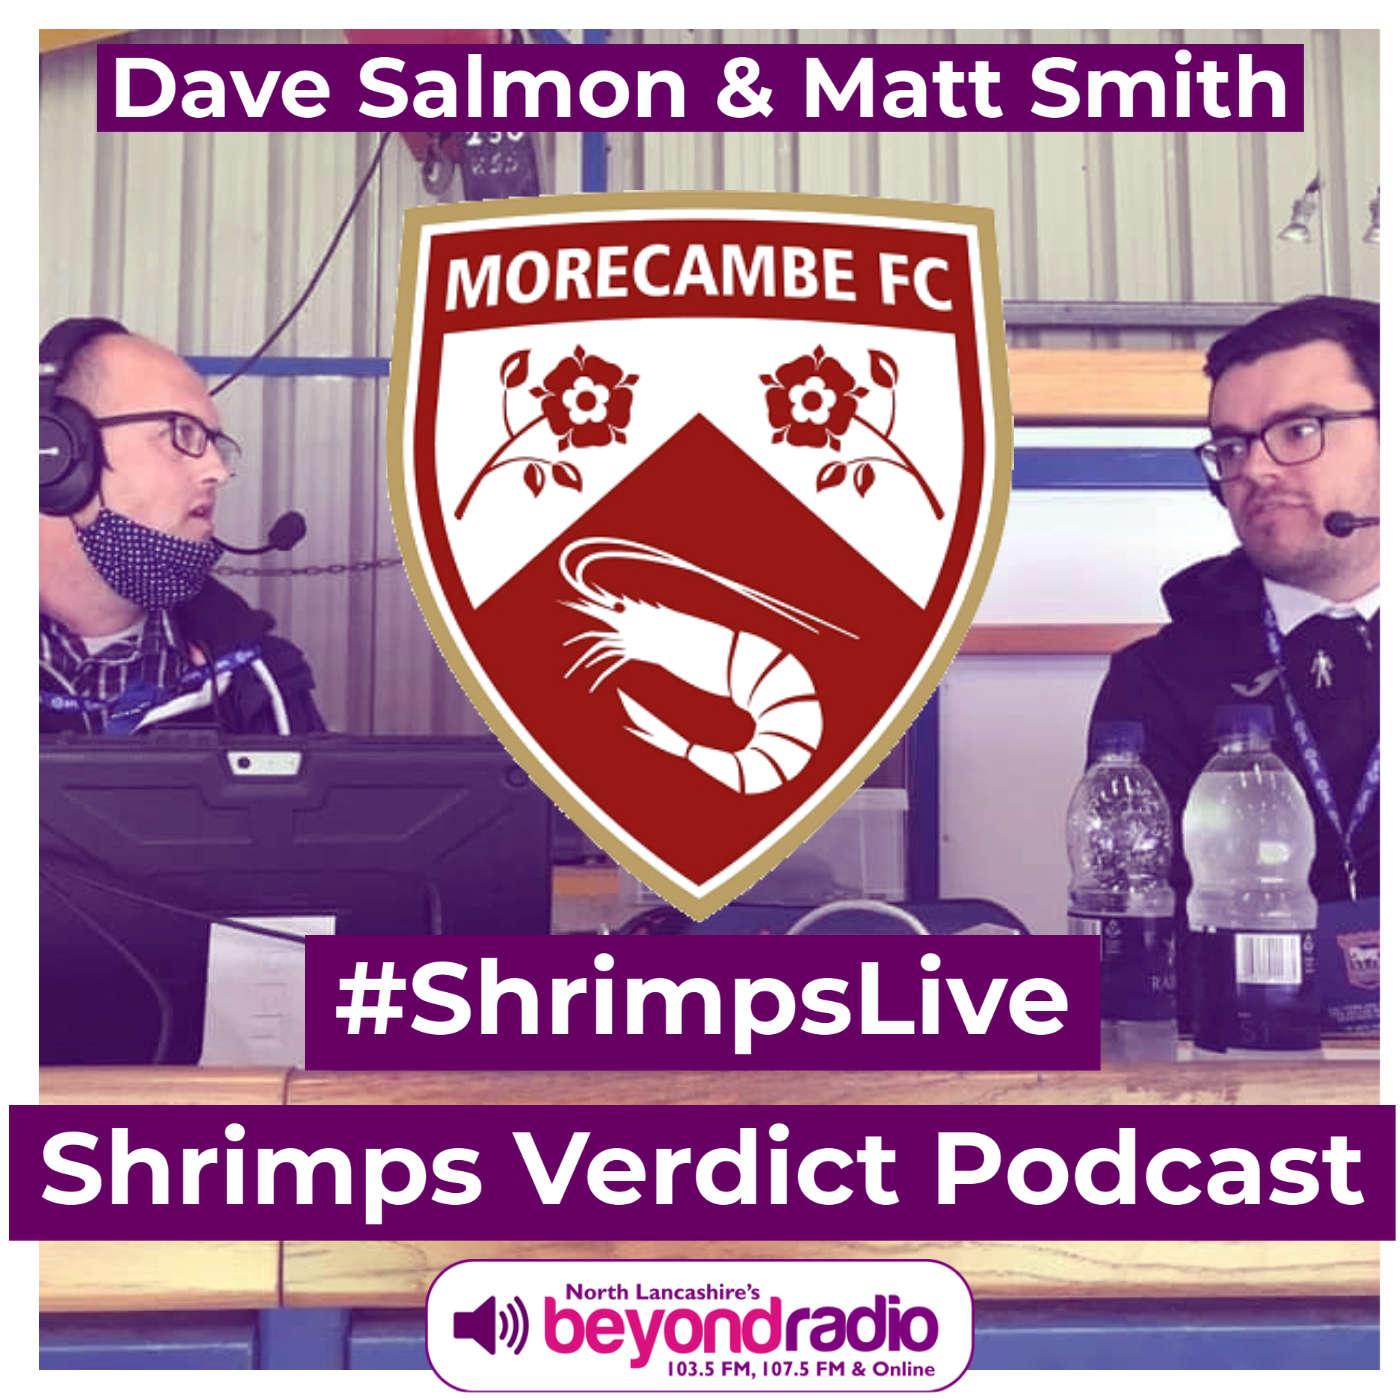 Shrimps Verdict